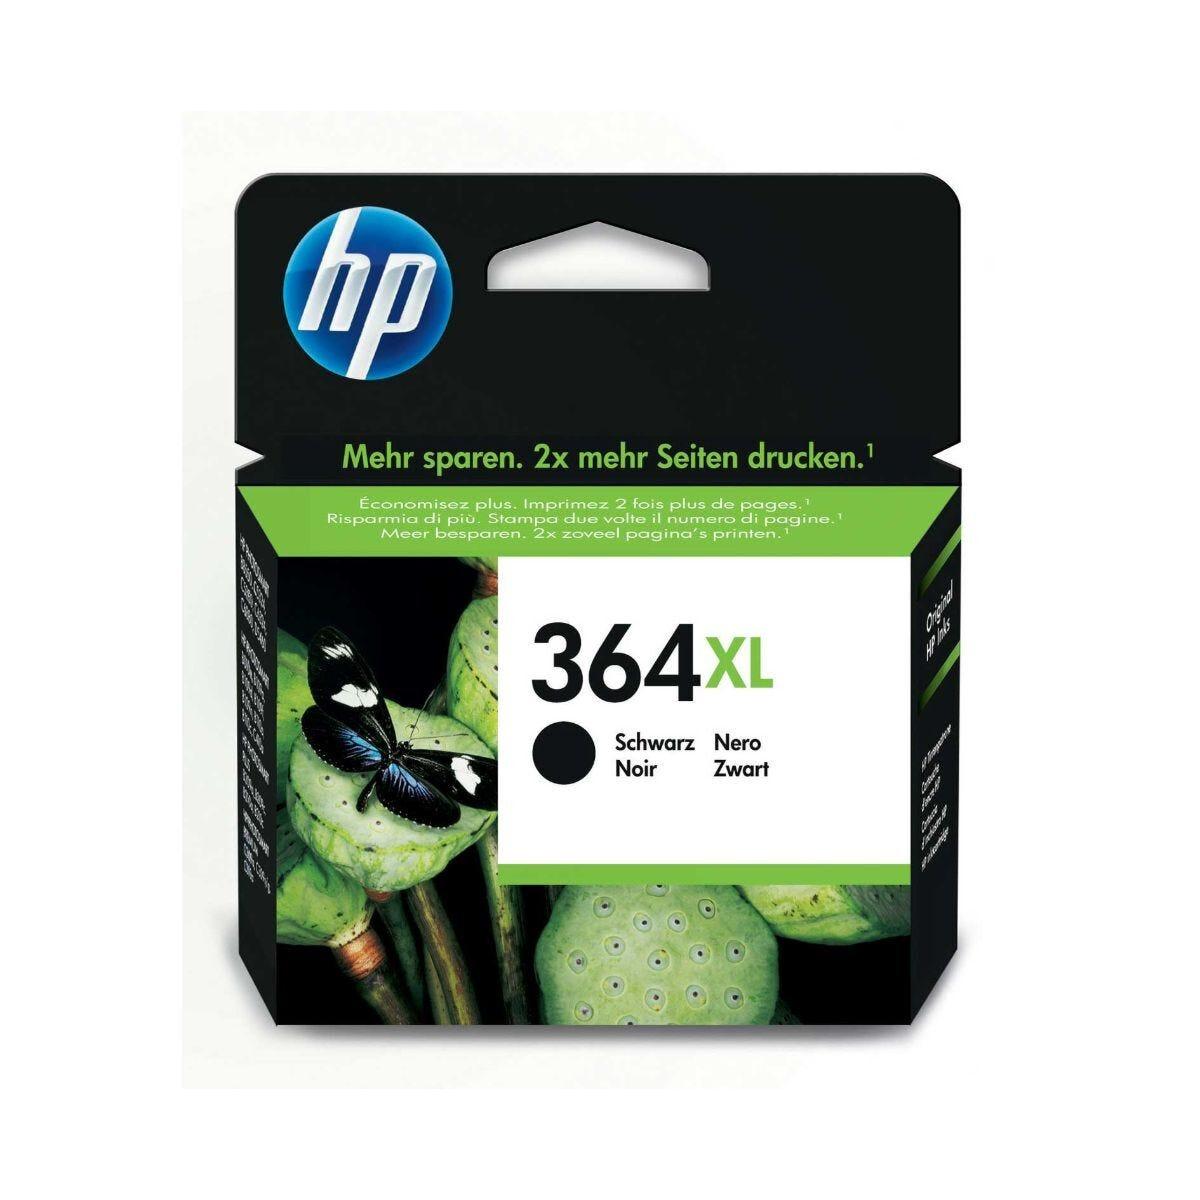 HP 364XL High Capacity Inkjet Cartridge